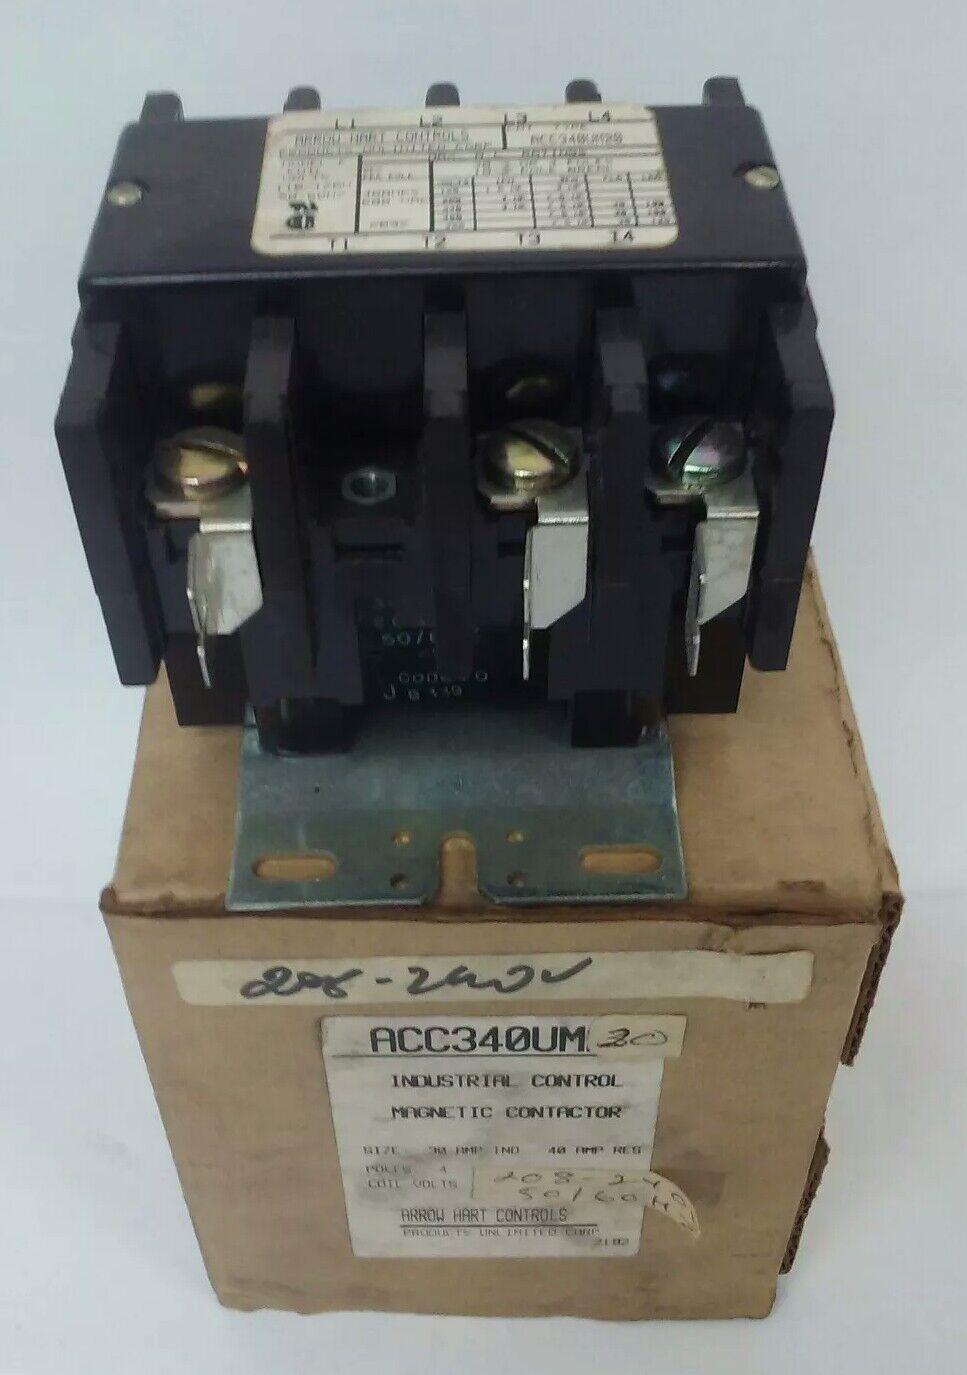 ARROW HART ACC340UM20 INDUSTRIAL CONTROL MAGNETIC CONTACTOR 4P 600V 40A 240VCOIL